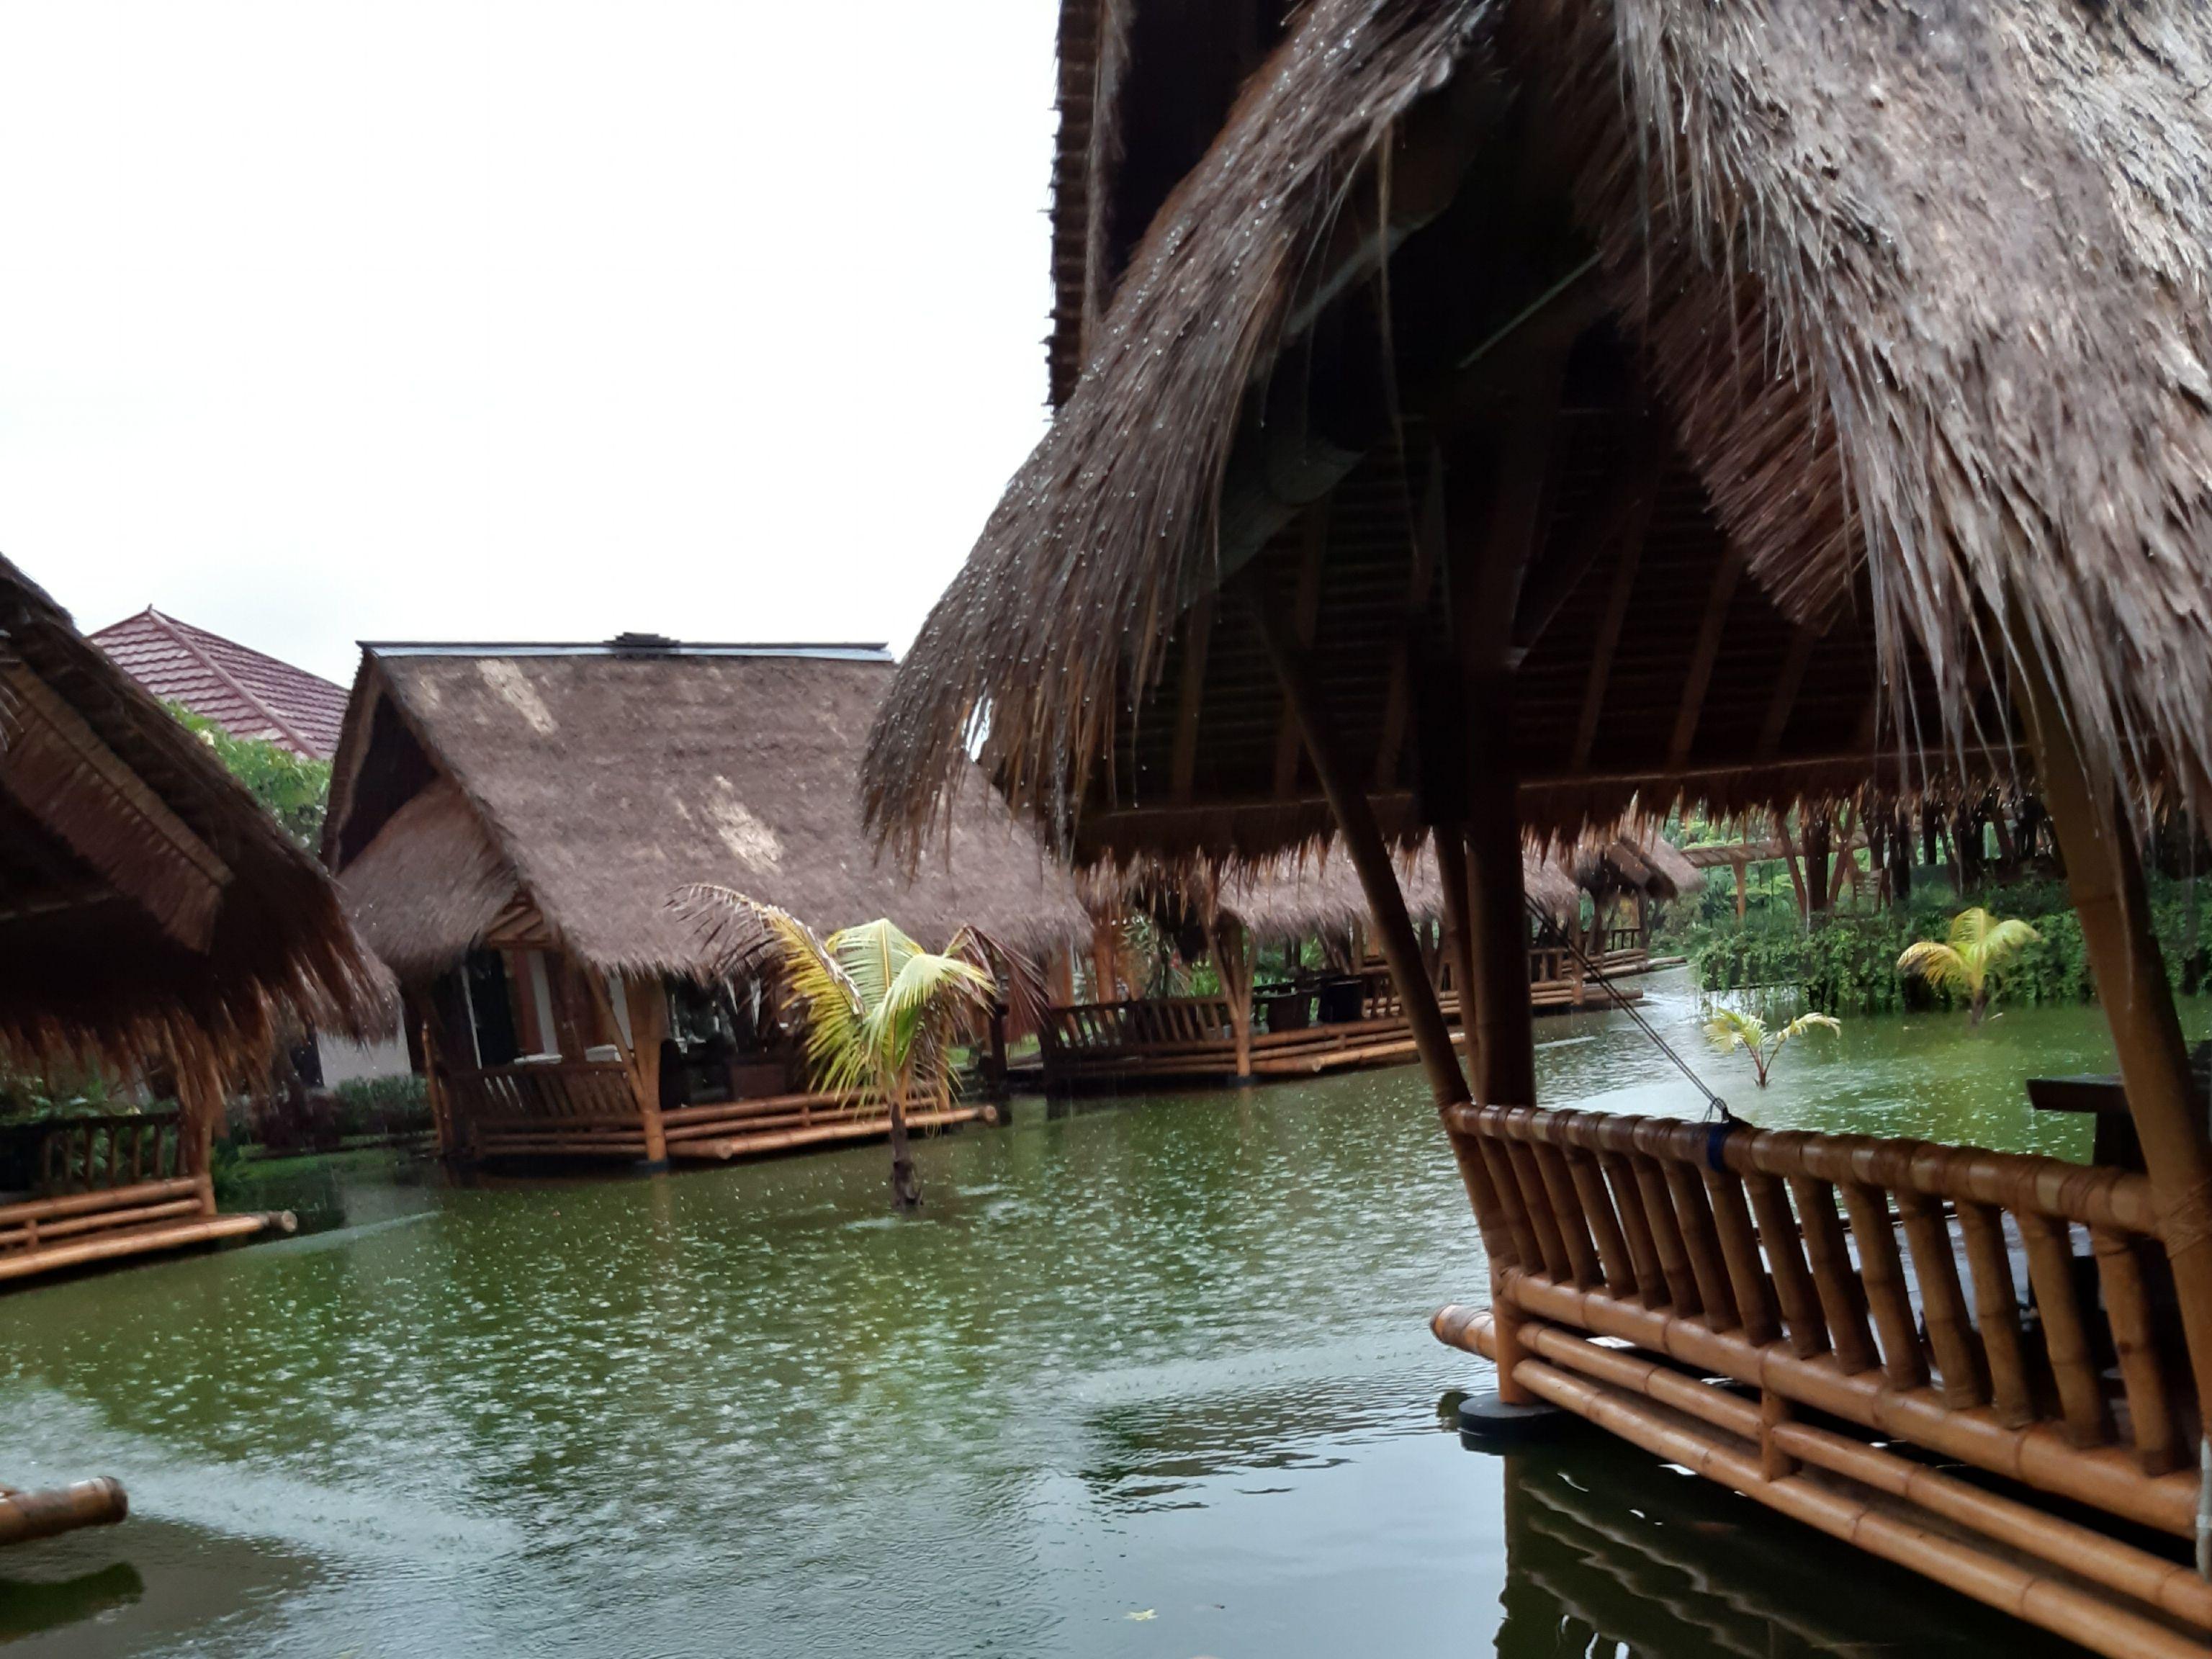 Tempat Makan dengan Suasana Alam di Kota Bekasi